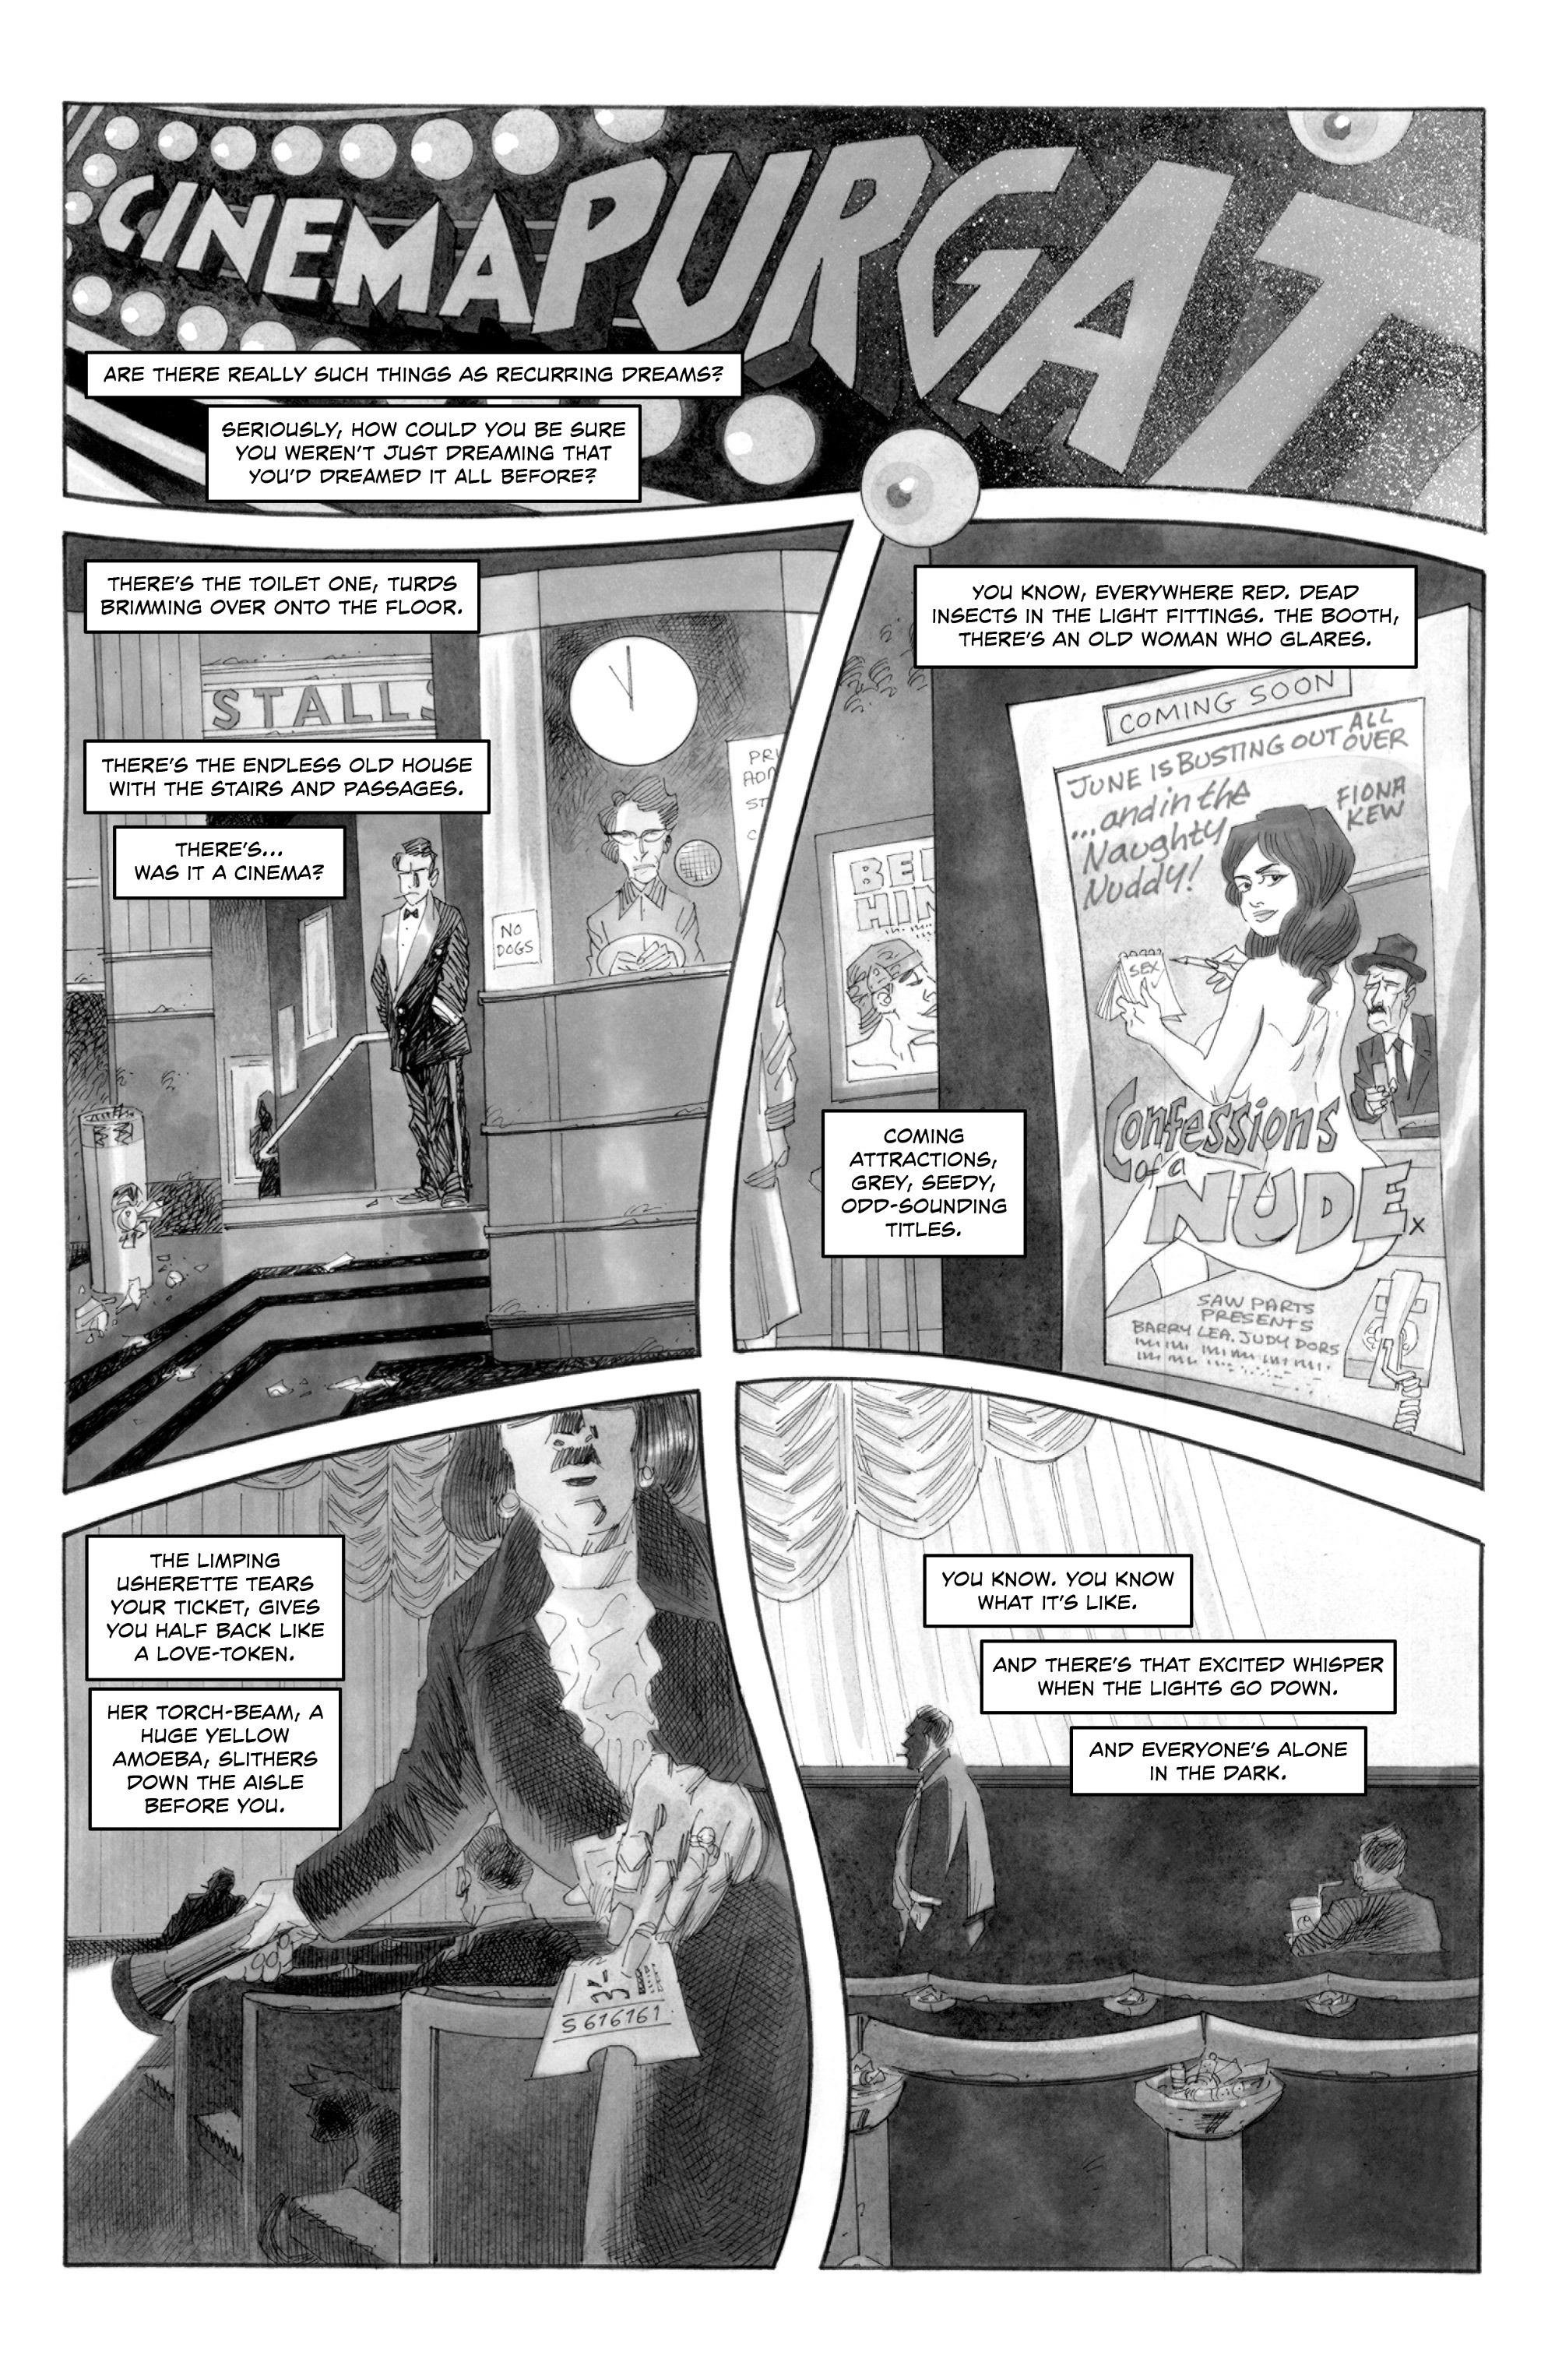 Read online Alan Moore's Cinema Purgatorio comic -  Issue #1 - 5